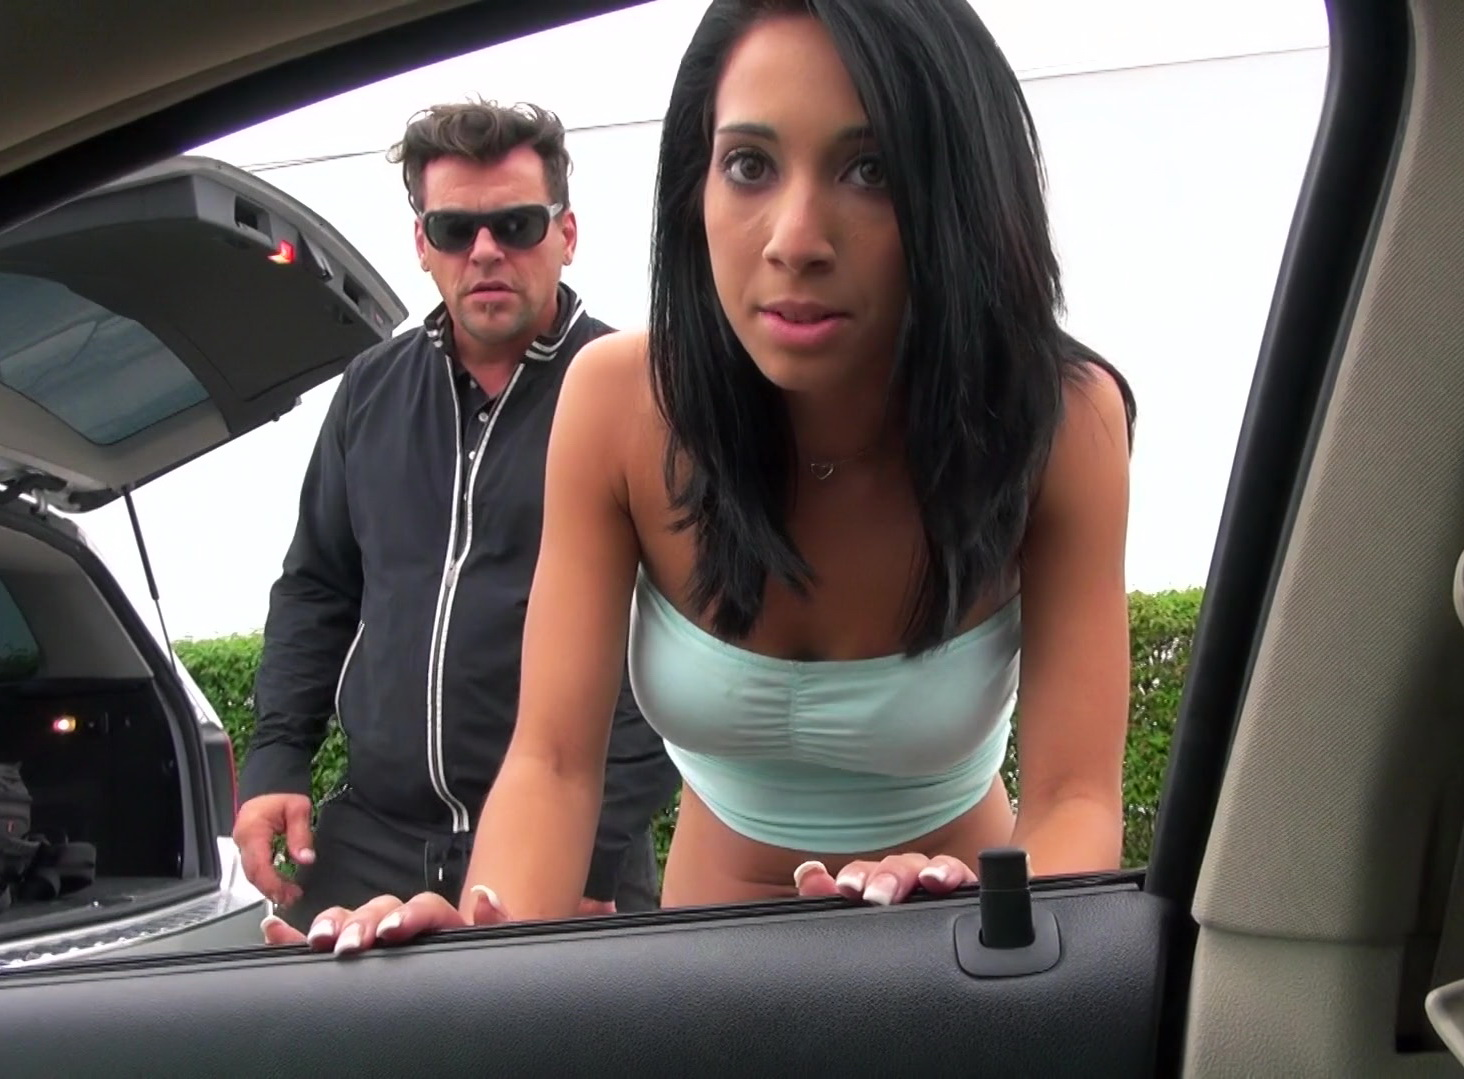 [MofosBSides.com] Mia Hurley - Road Head Revenge Fuck (2013) [HD 1080p]